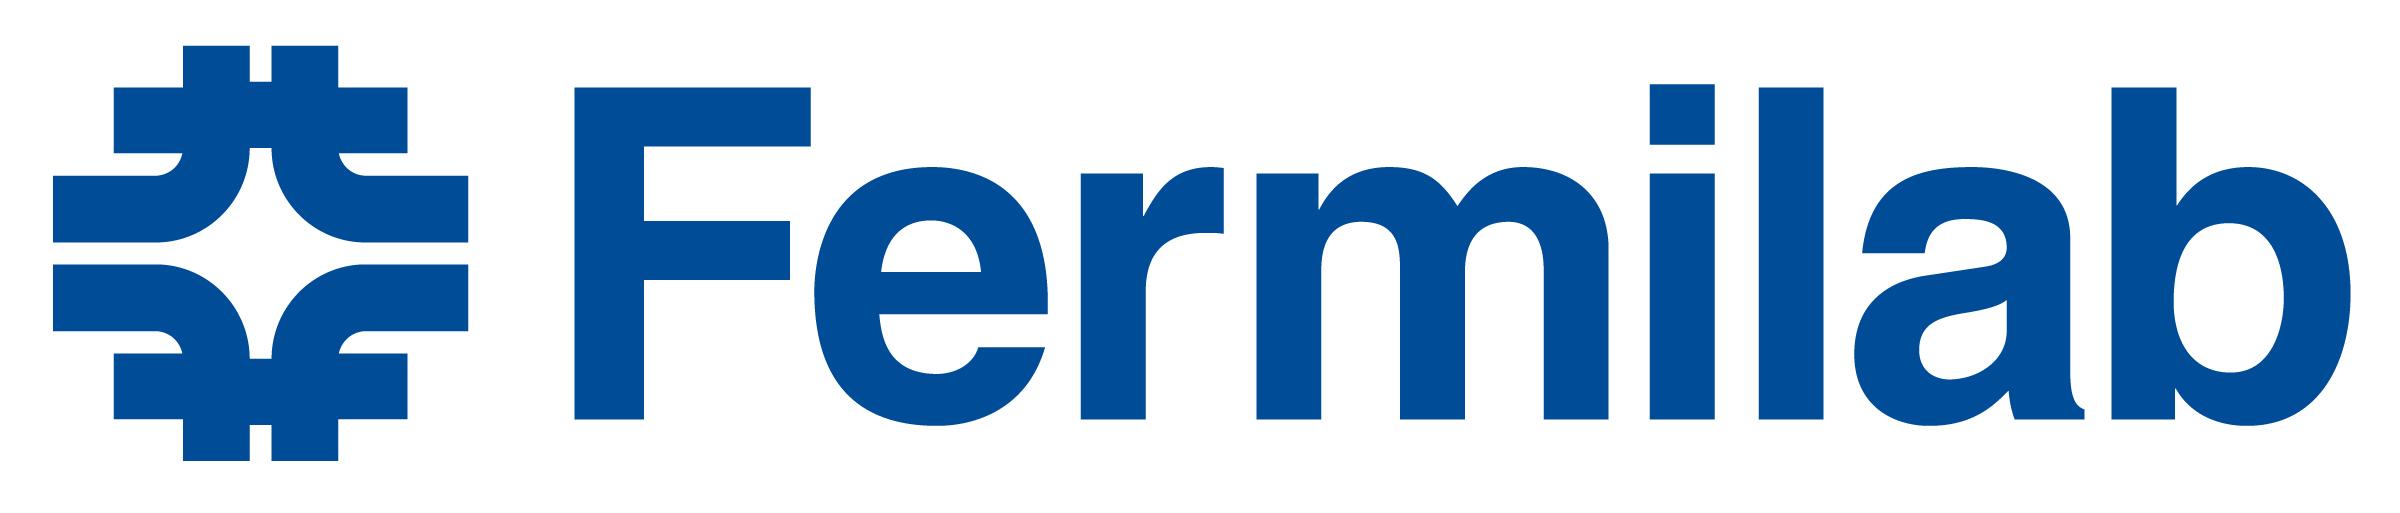 Fnal logo nal blue